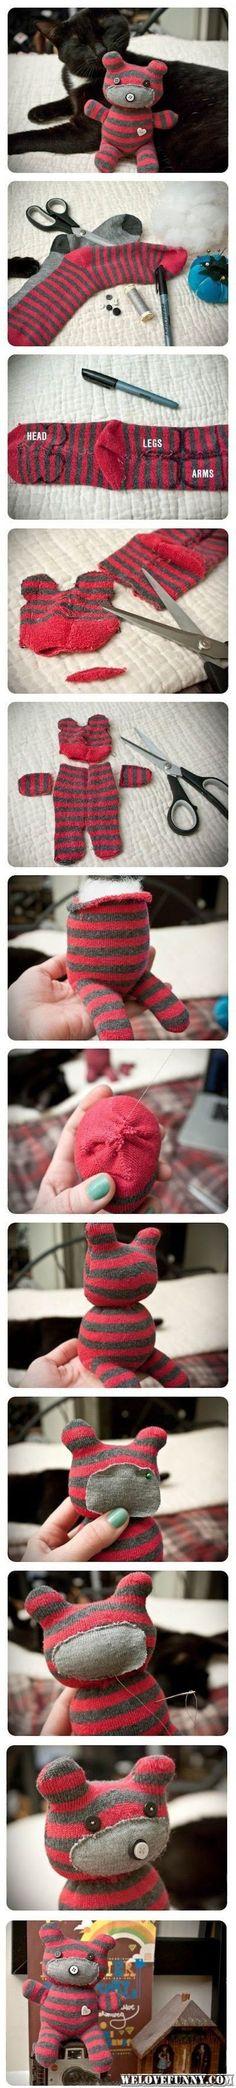 How to use the #socks make cloth bears #diy #crafts: